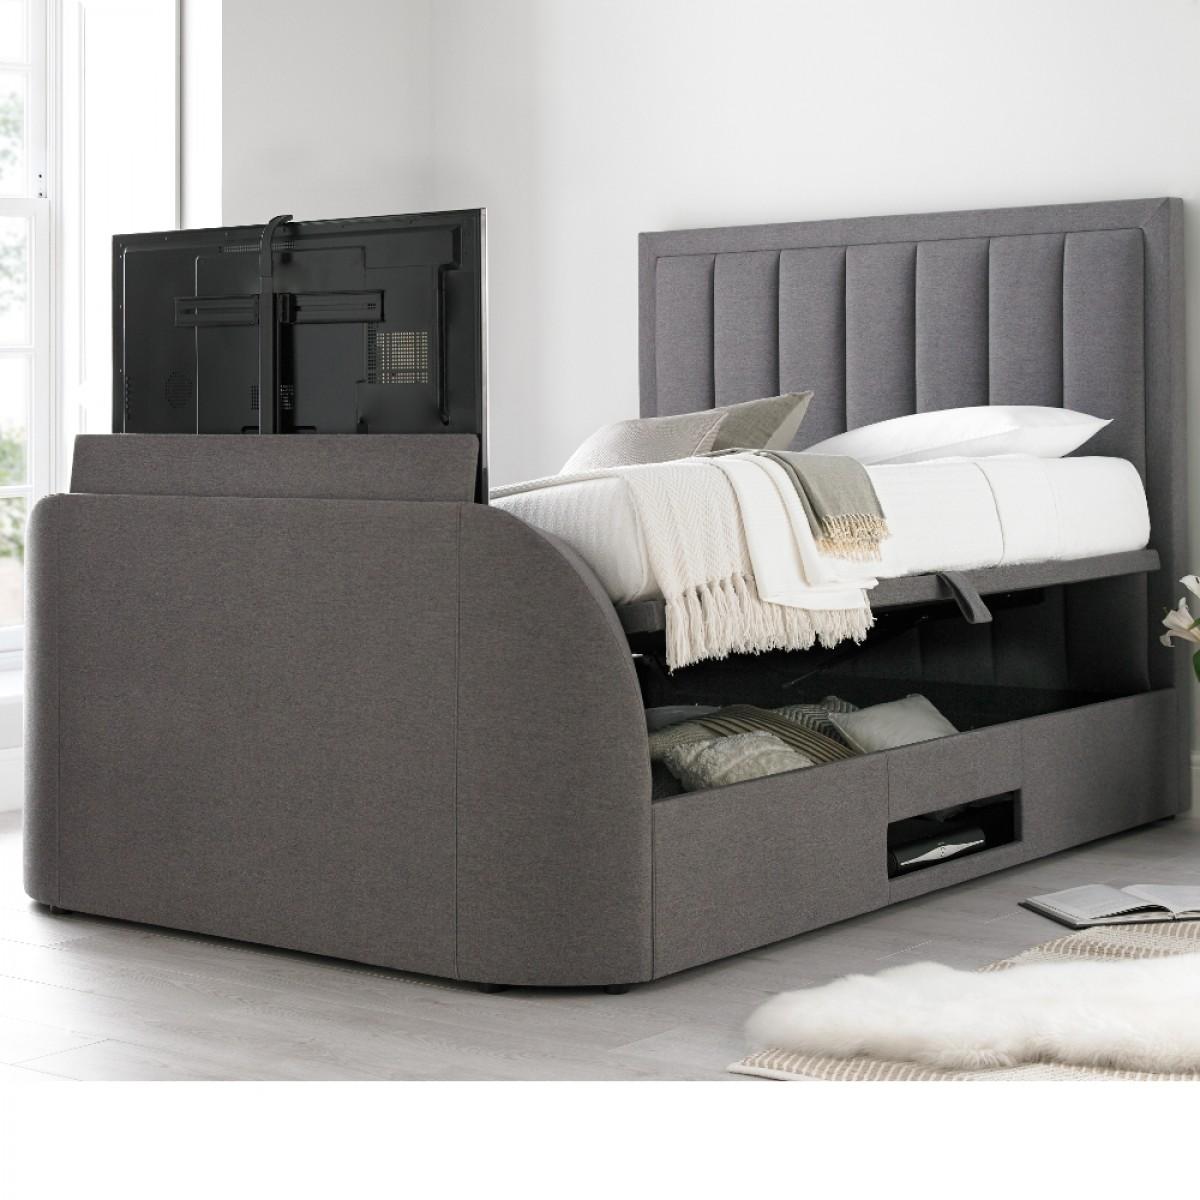 Ventura Grey Fabric Ottoman TV Bed